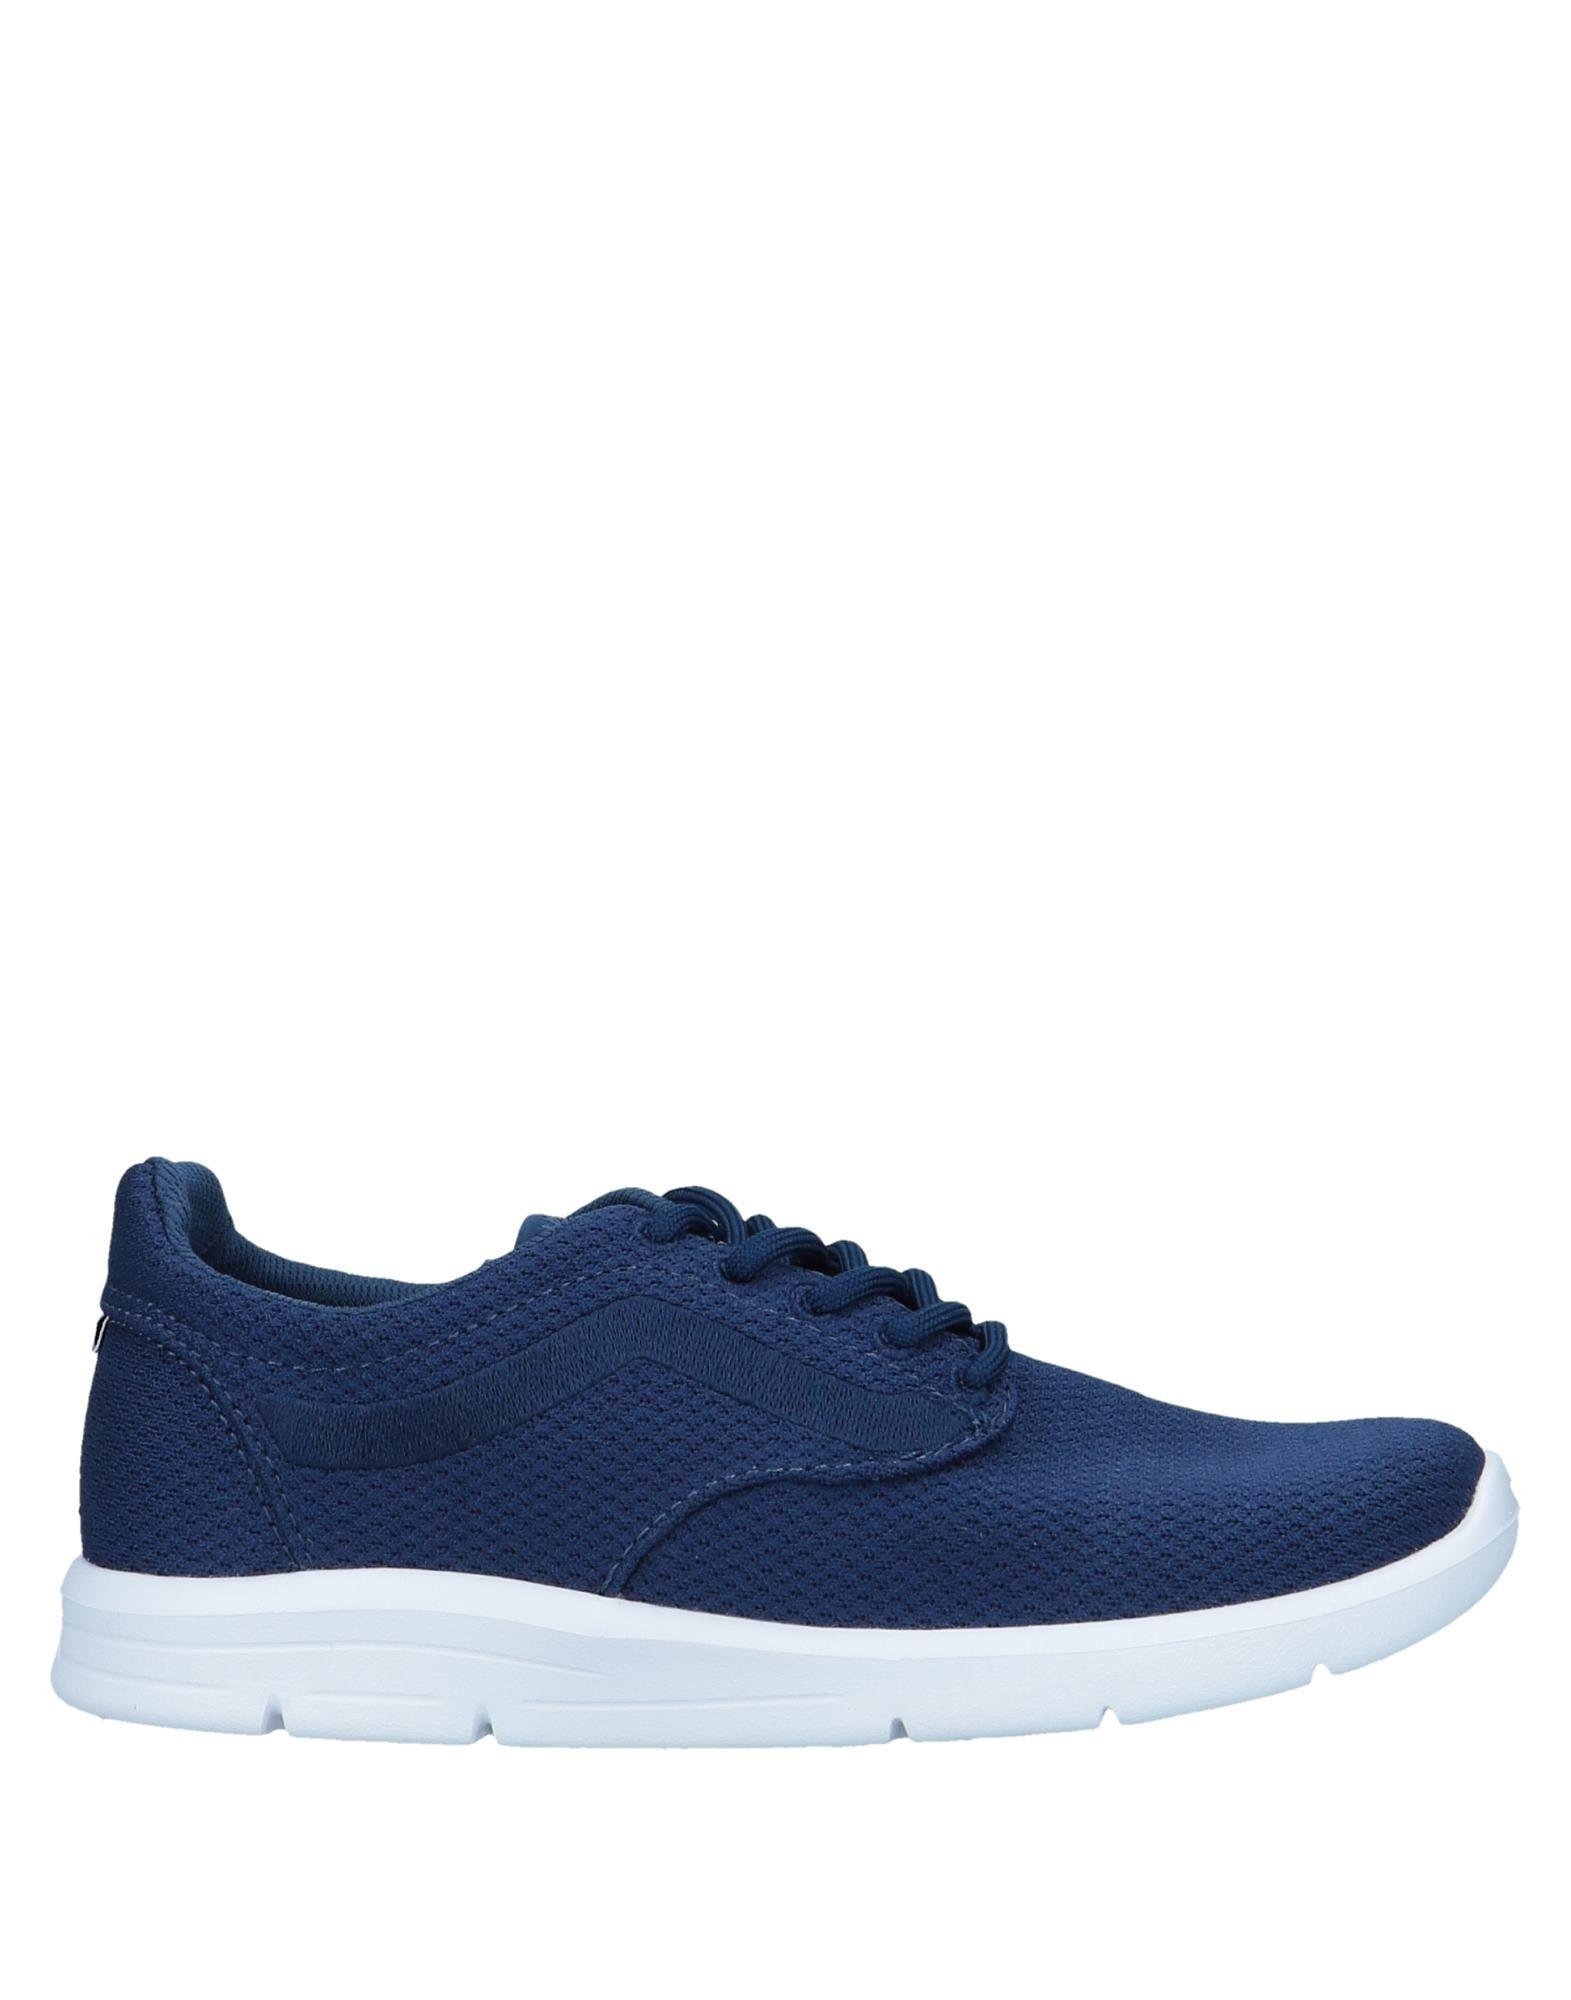 Sneakers Vans Donna - 11574134FQ Scarpe comode comode comode e distintive f51eaa